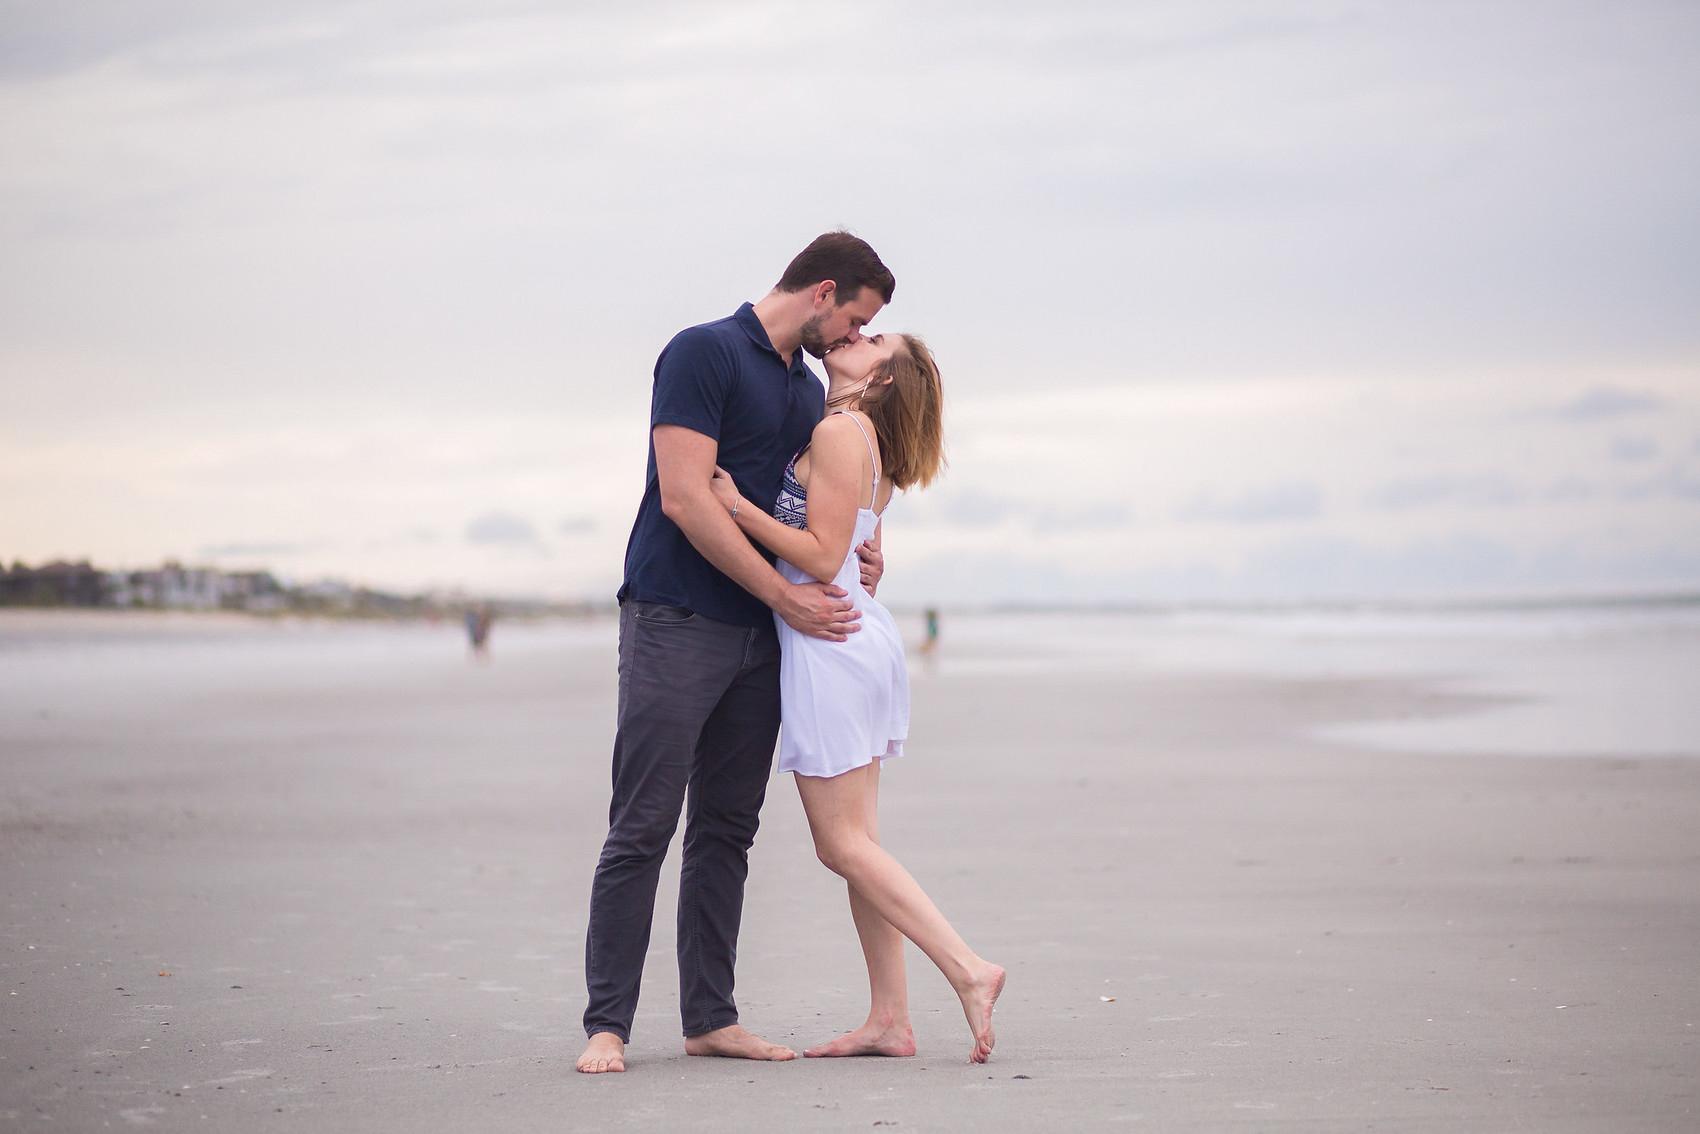 adam-szarmack-jacksonville-wedding-photographer-atlantic-beach-engagement-pictures-31.jpg